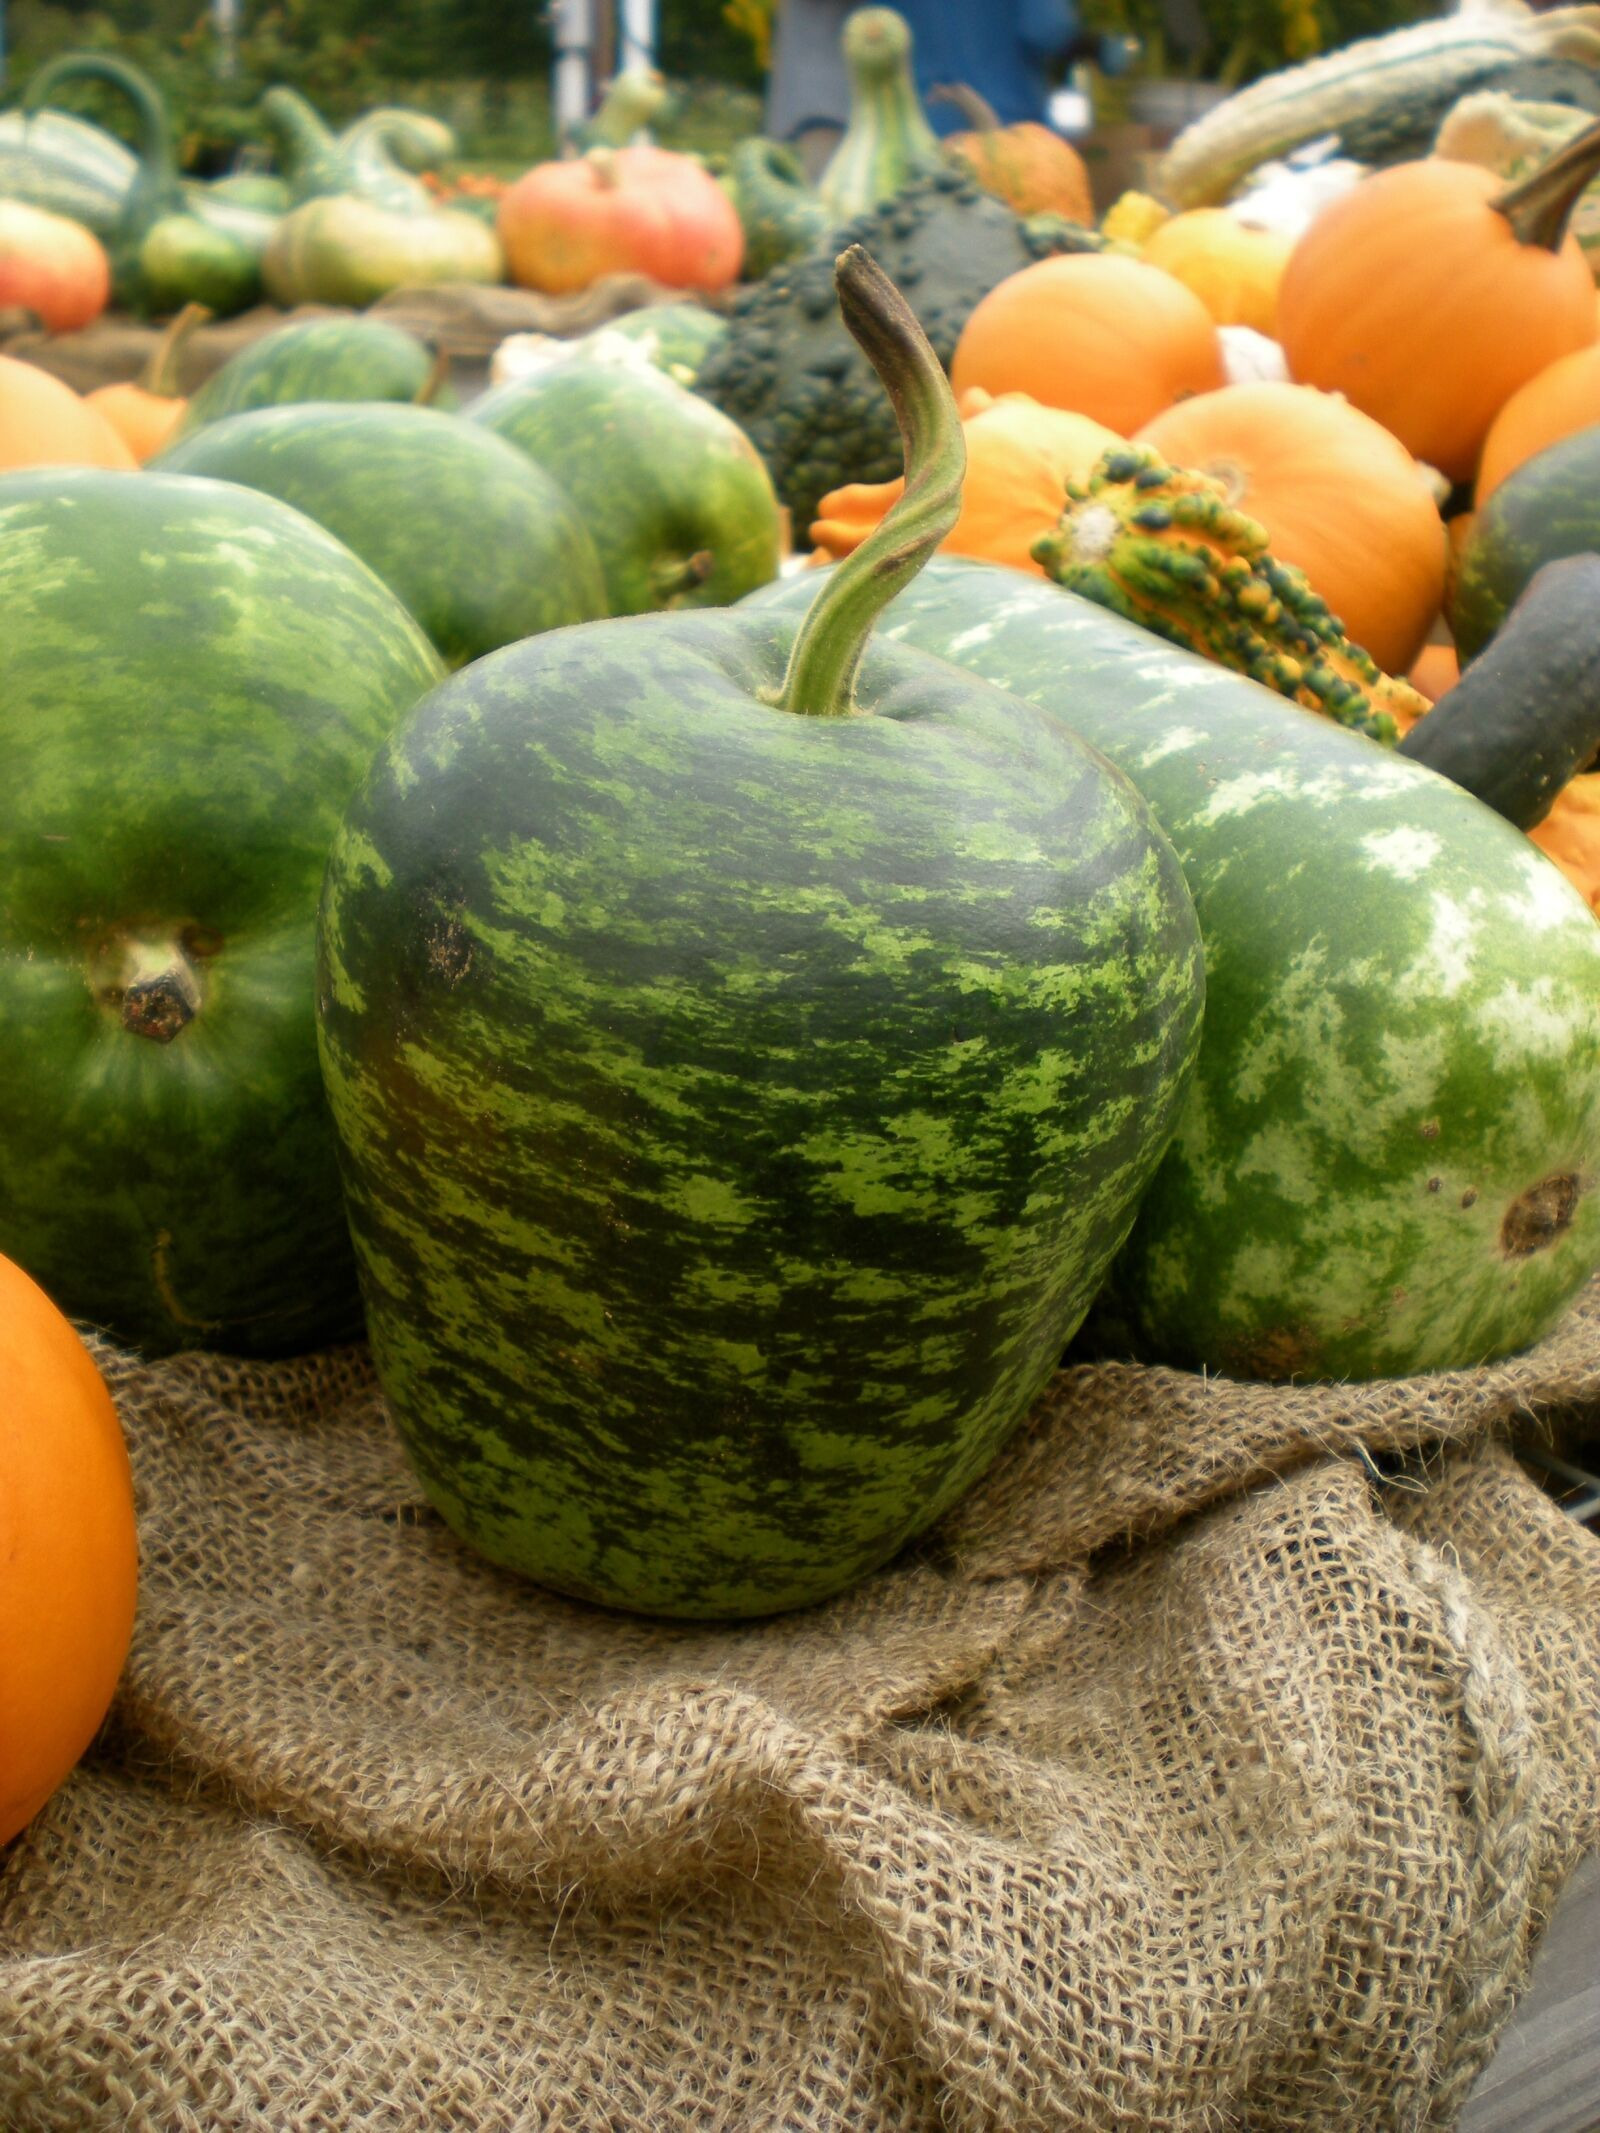 "Nikon COOLPIX S202 sample photo. ""Squash, vegetables, food"" photography"